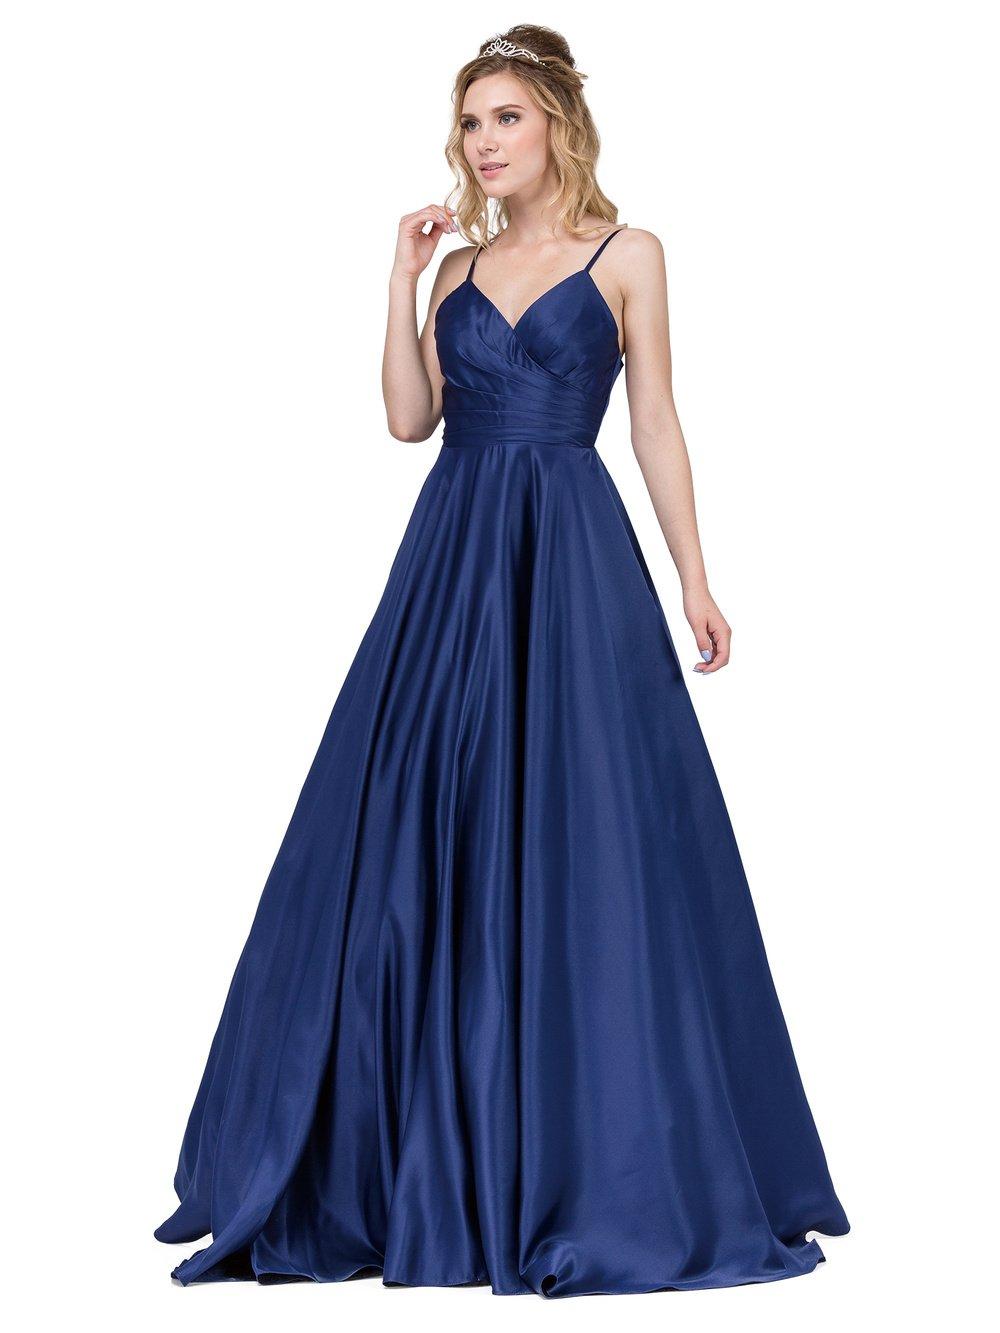 Navy Long V-Neck Prom Dress with Adjustable Straps